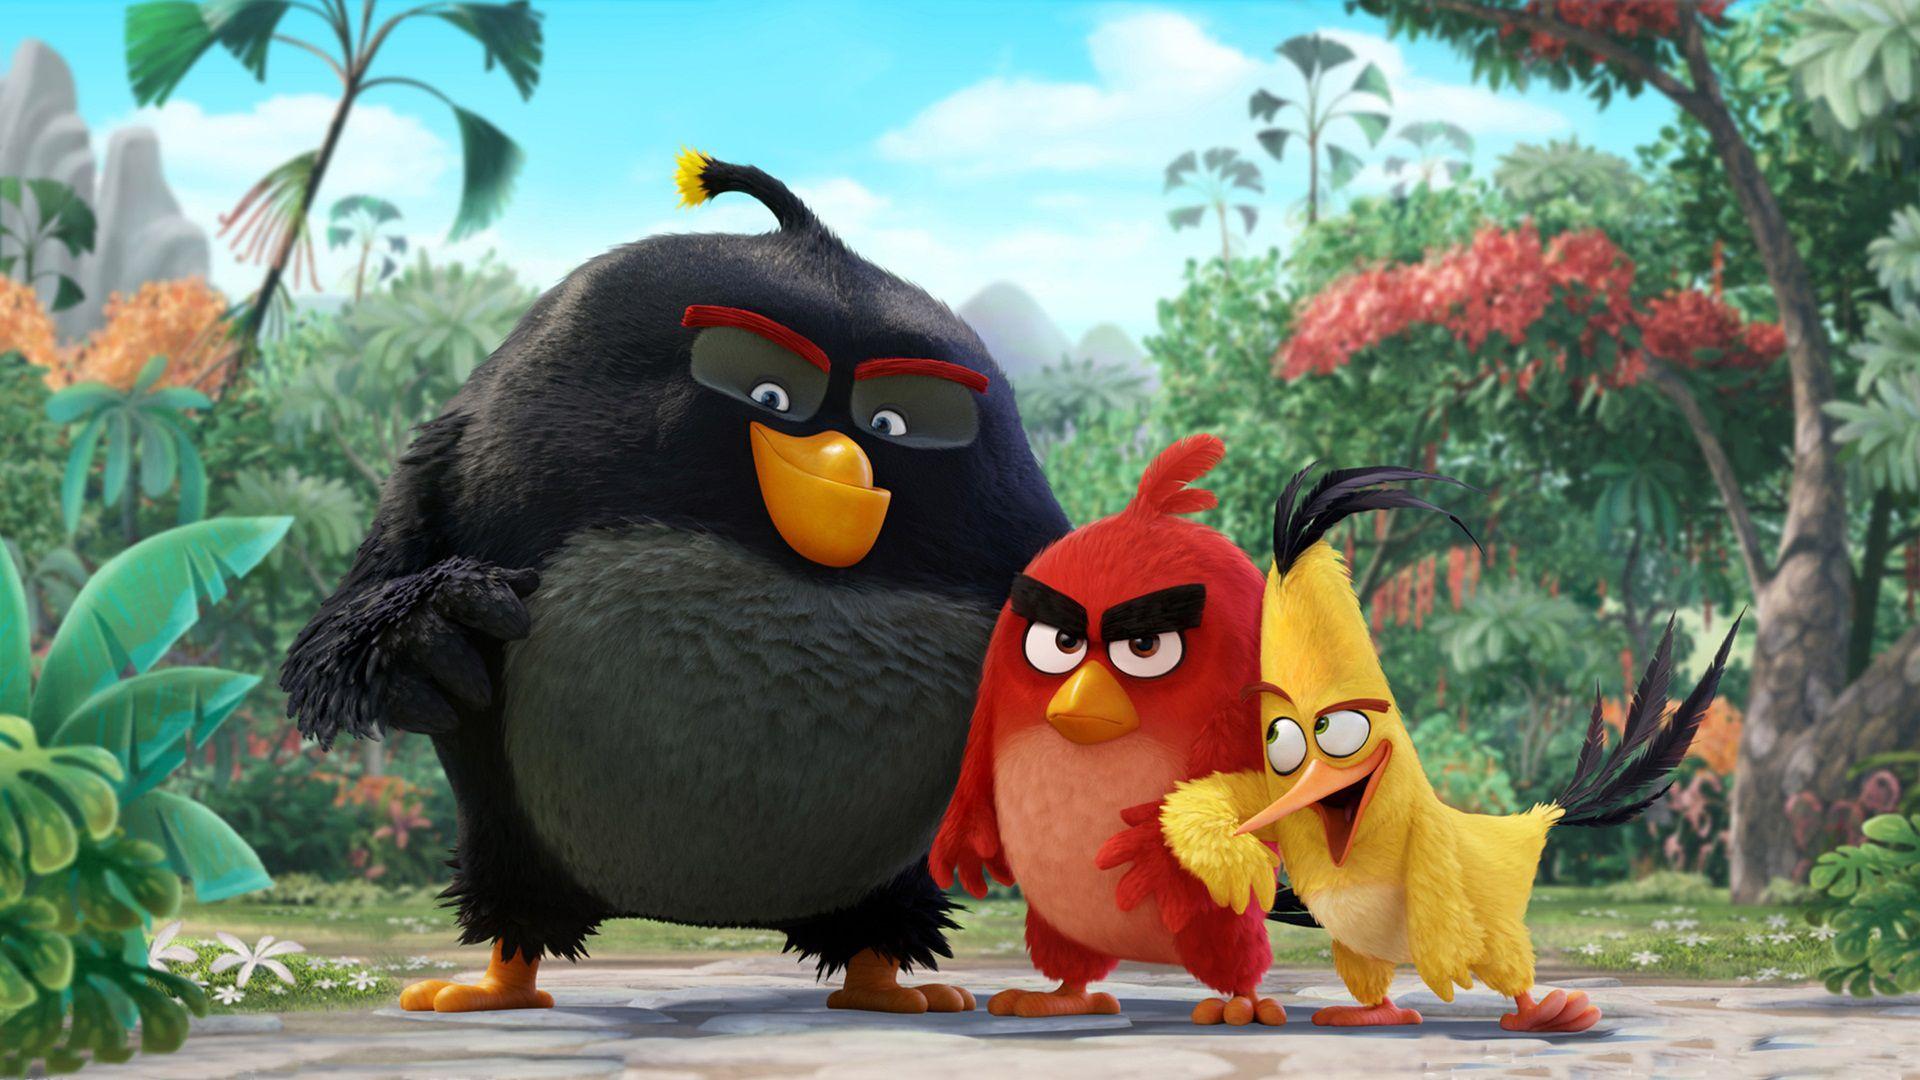 Angry birds movie trailer photos